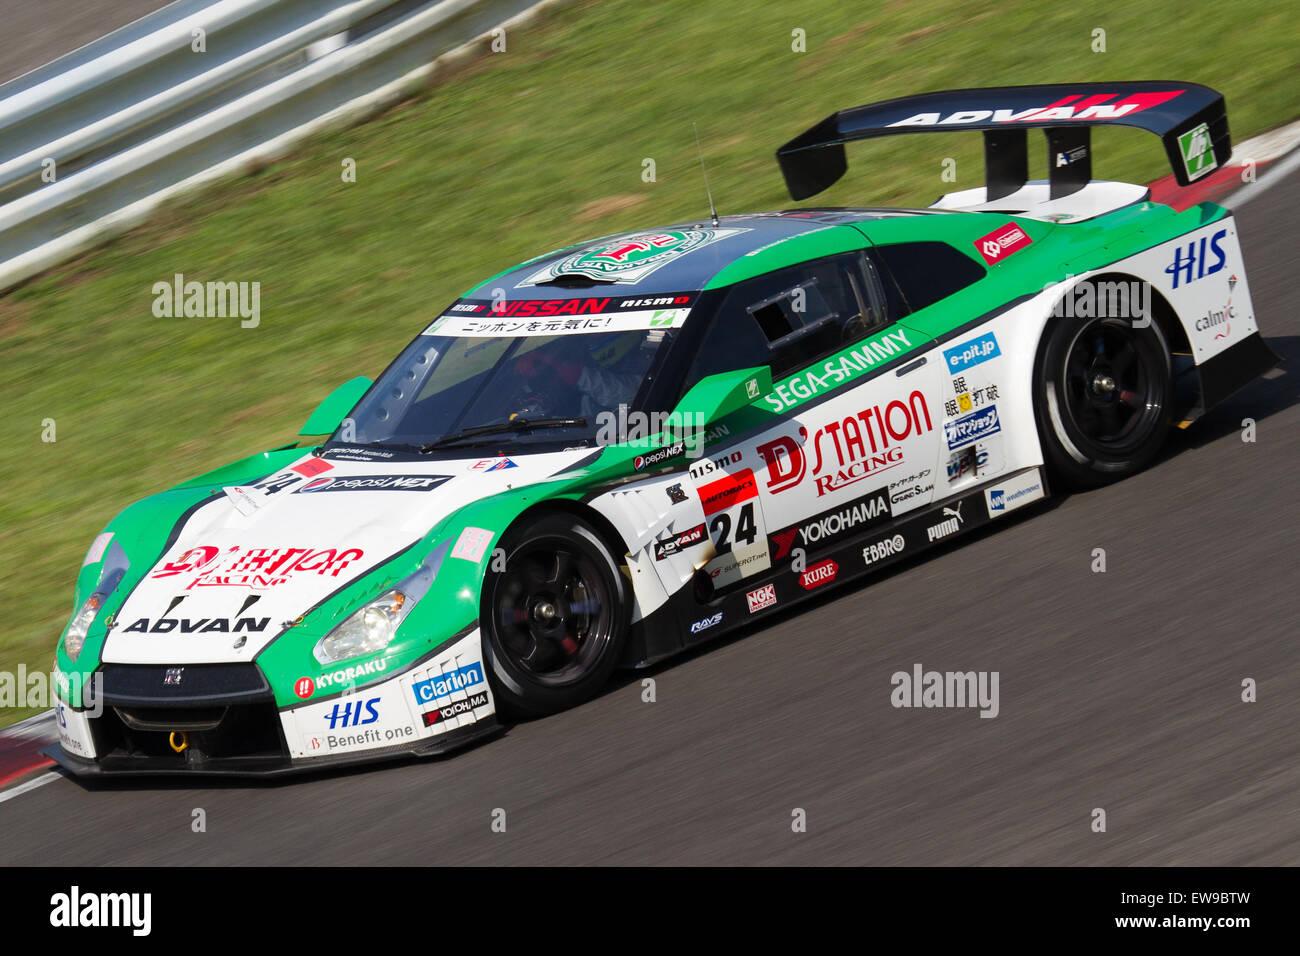 D'station Advan GT-R 2012 Super GT Sugo free practice - Stock Image